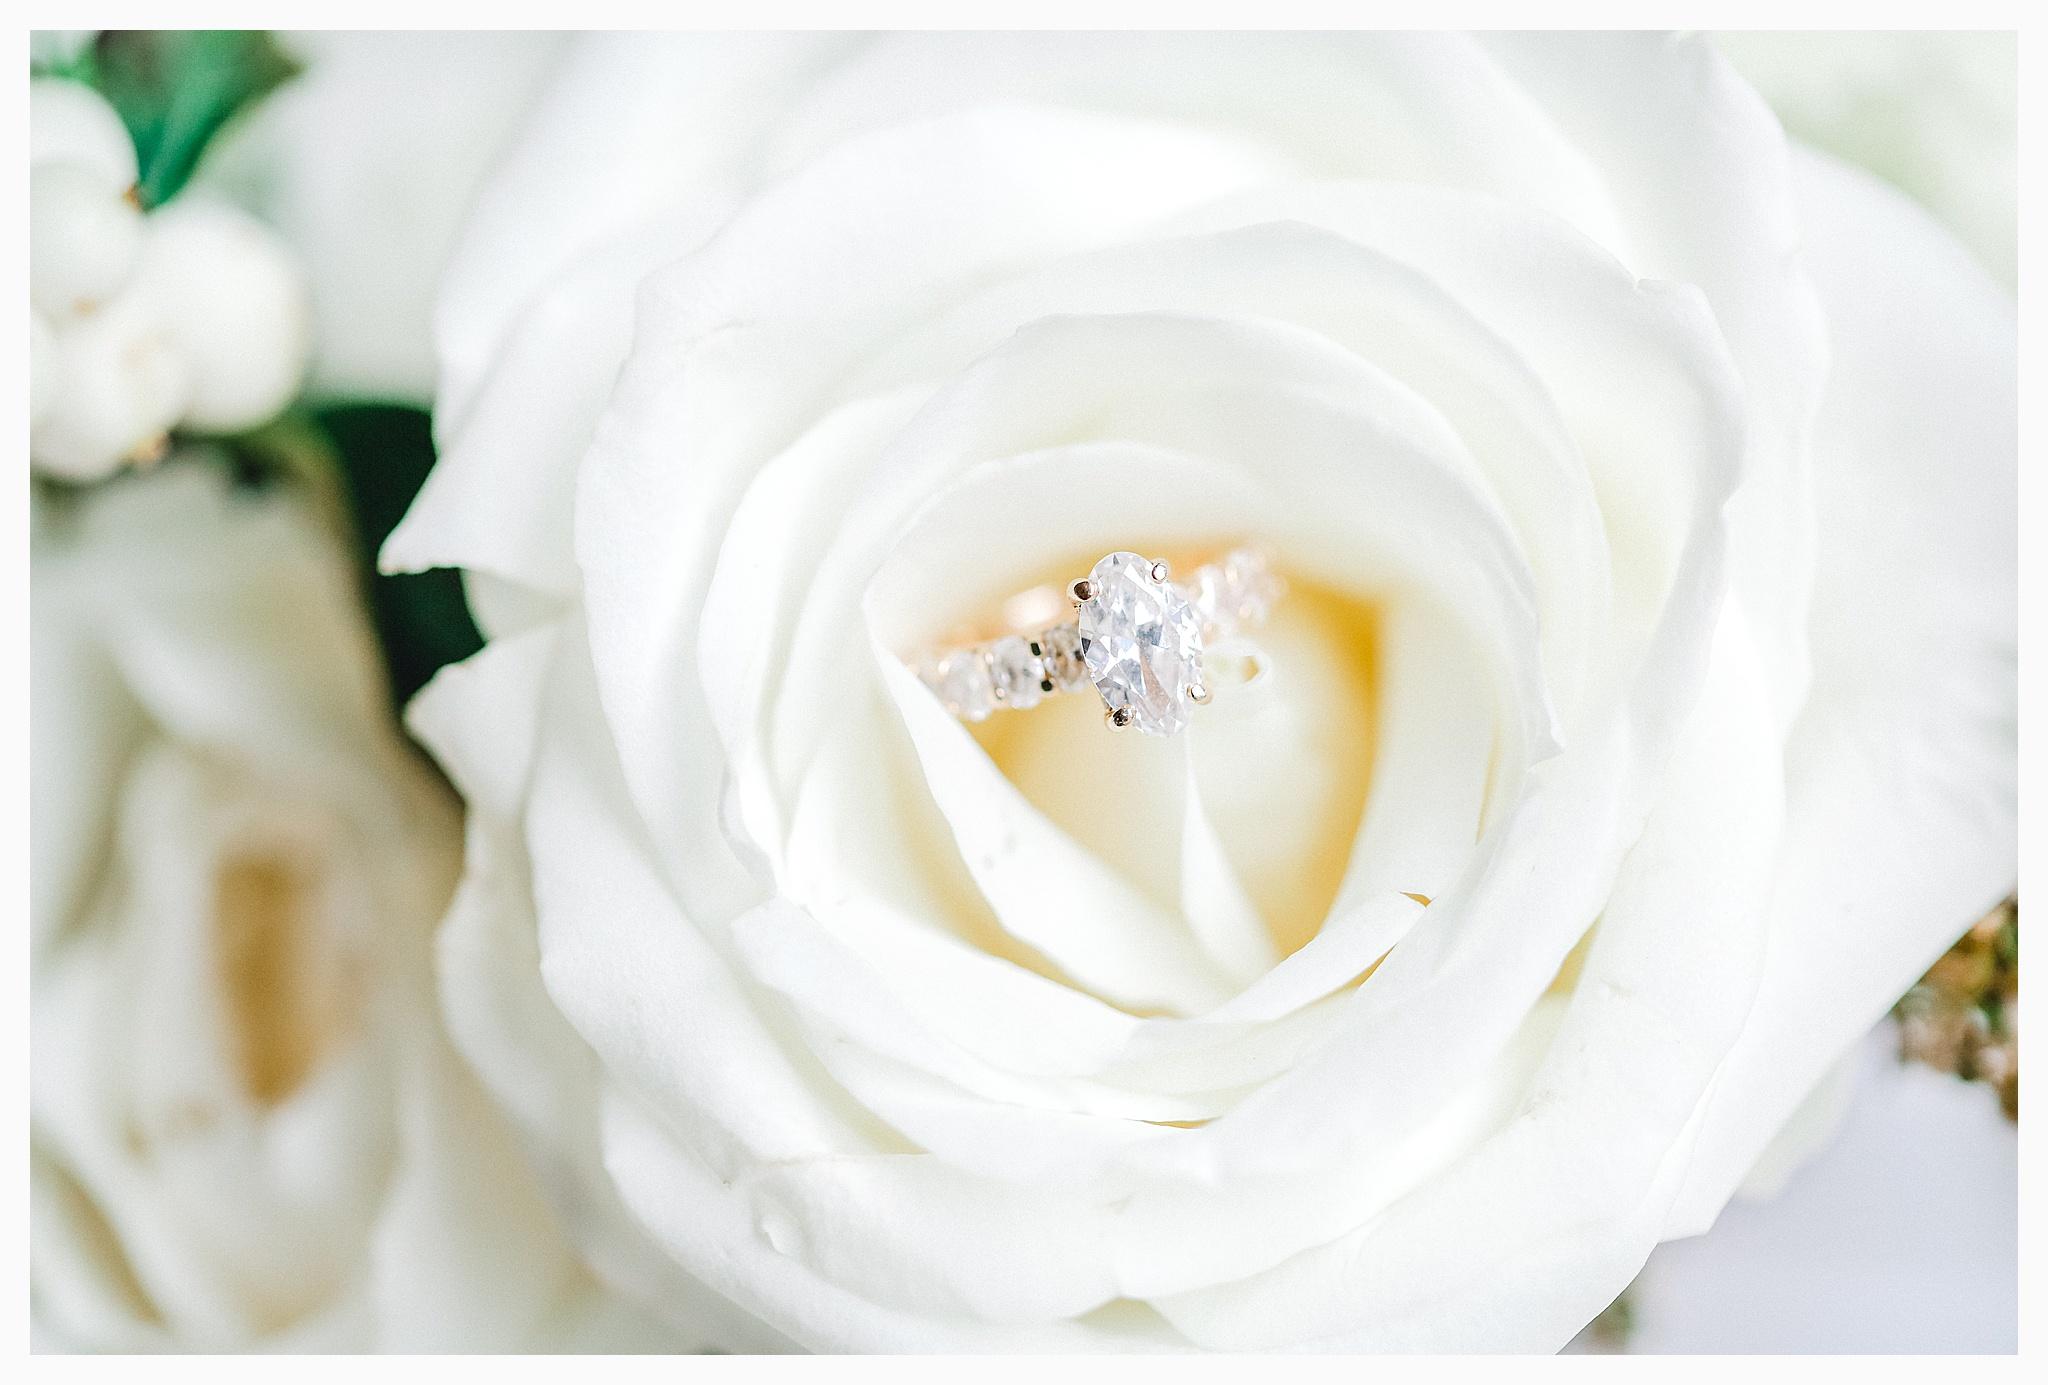 Emma Rose Company Light and Airy Wedding Photographer, Beautiful fall wedding at Rock Creek Gardens Venue in Puyallup, Washington._0010.jpg